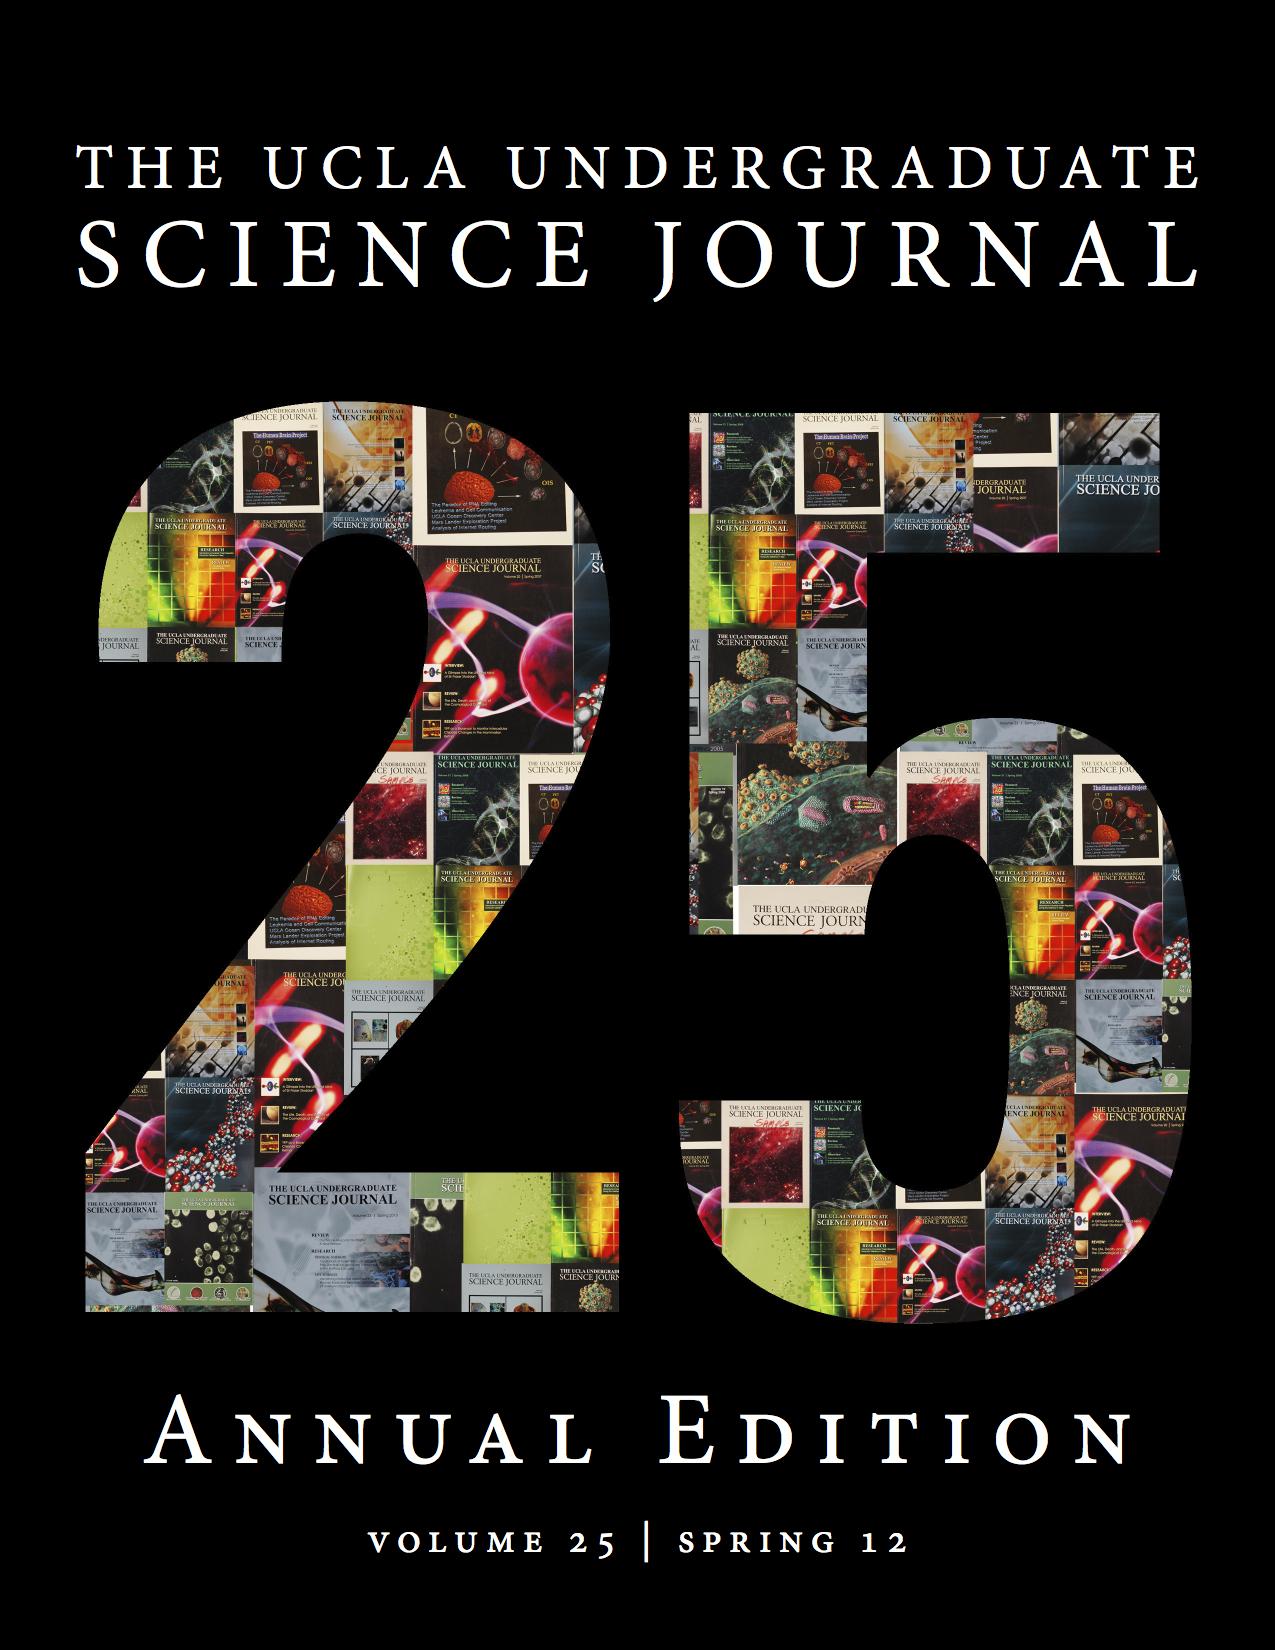 25th Annual Edition